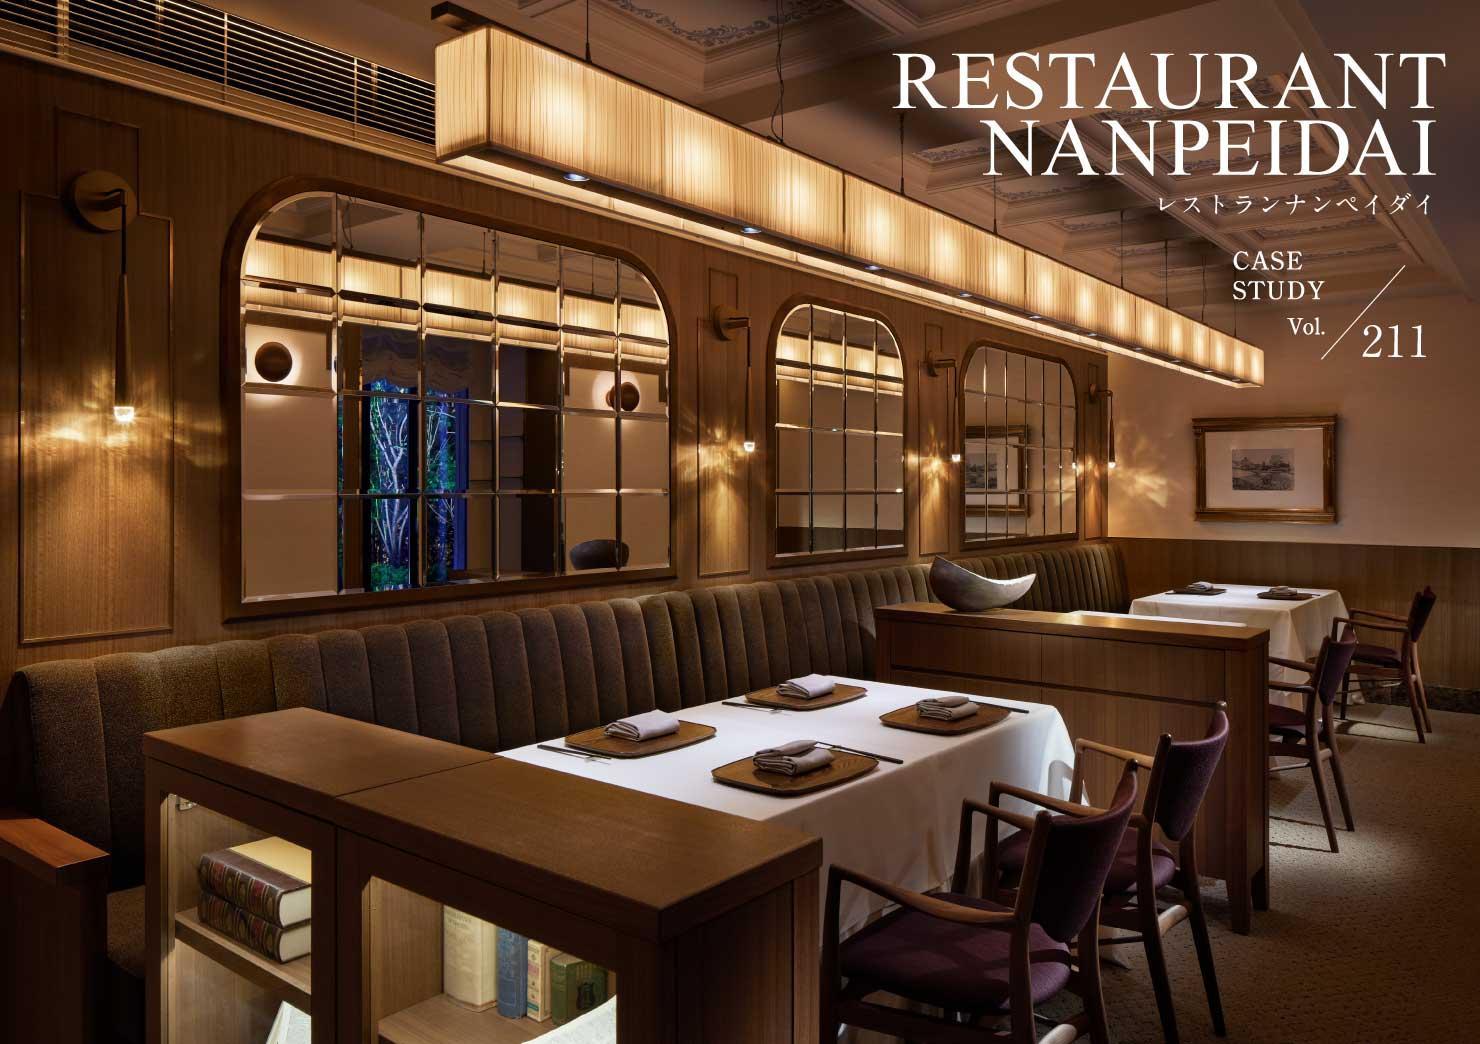 CASE STUDY Vol.211 RESTAURANT NANPEIDAI レストランナンペイダイ